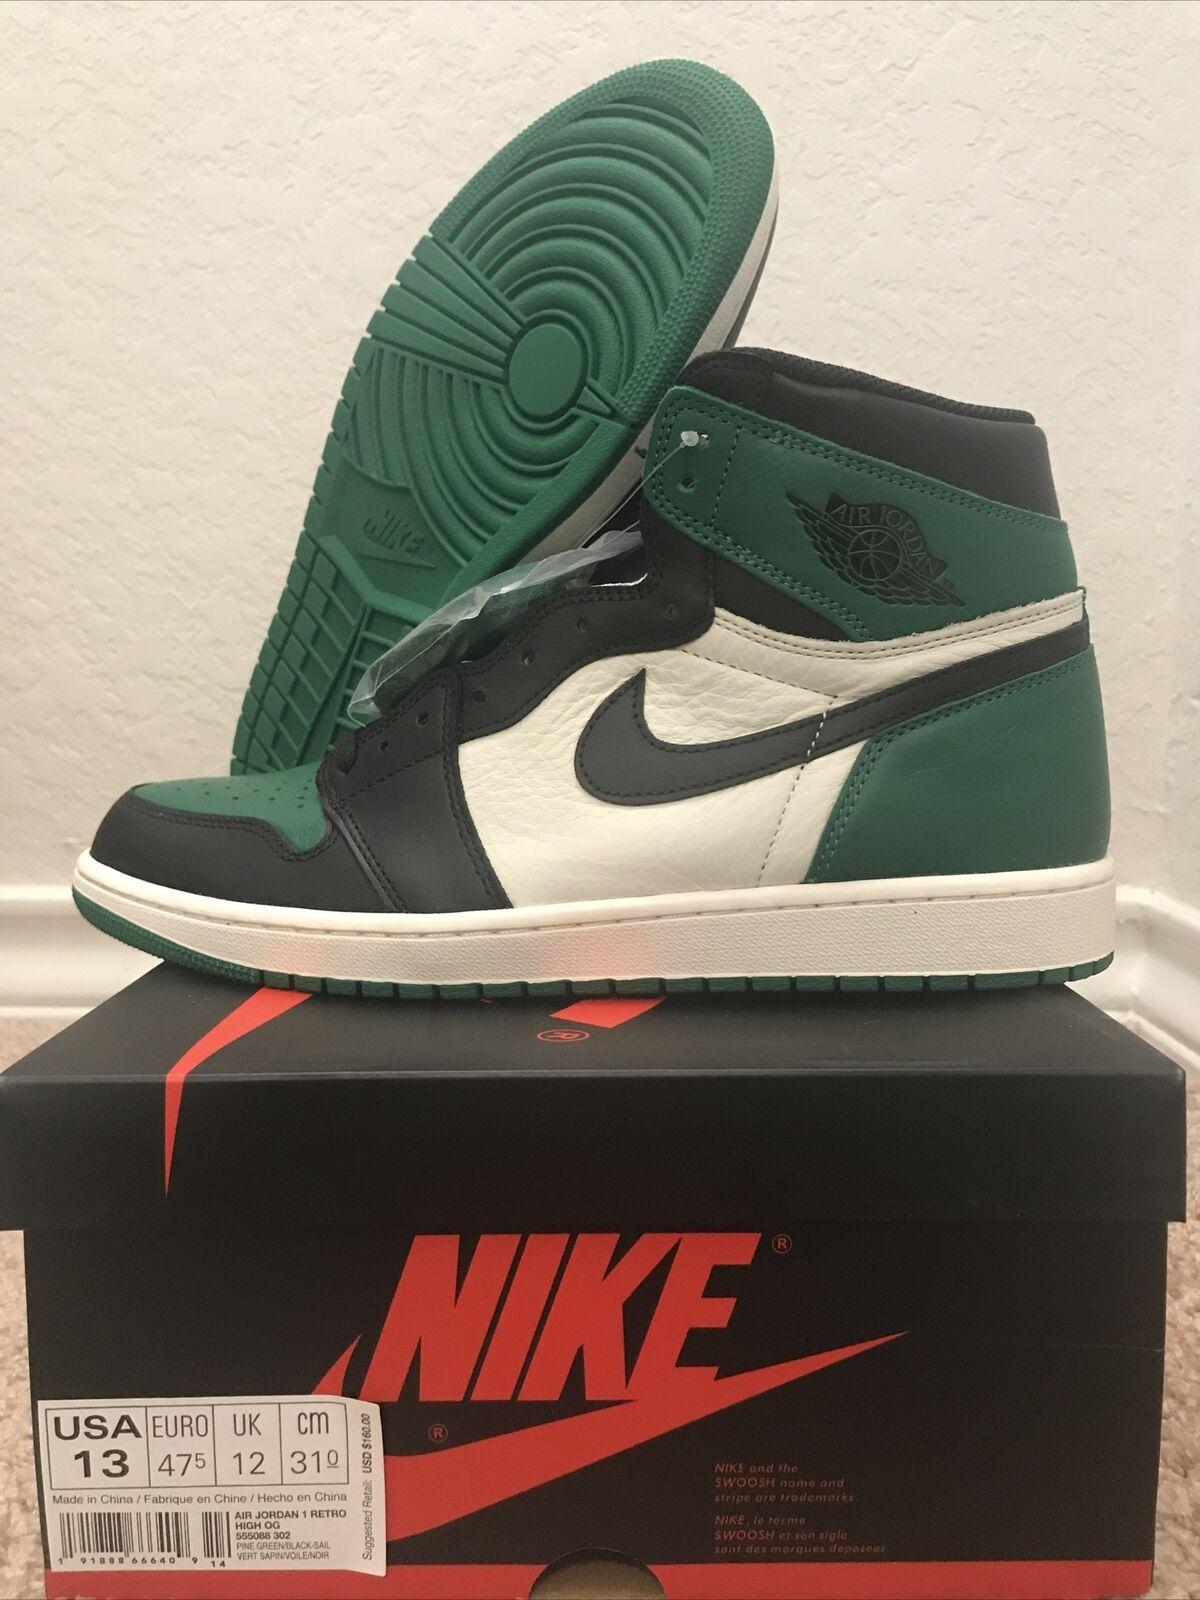 Nike Air Jordan 1 Retro High OG Size 13 - Pine Green/ Black Sail ...